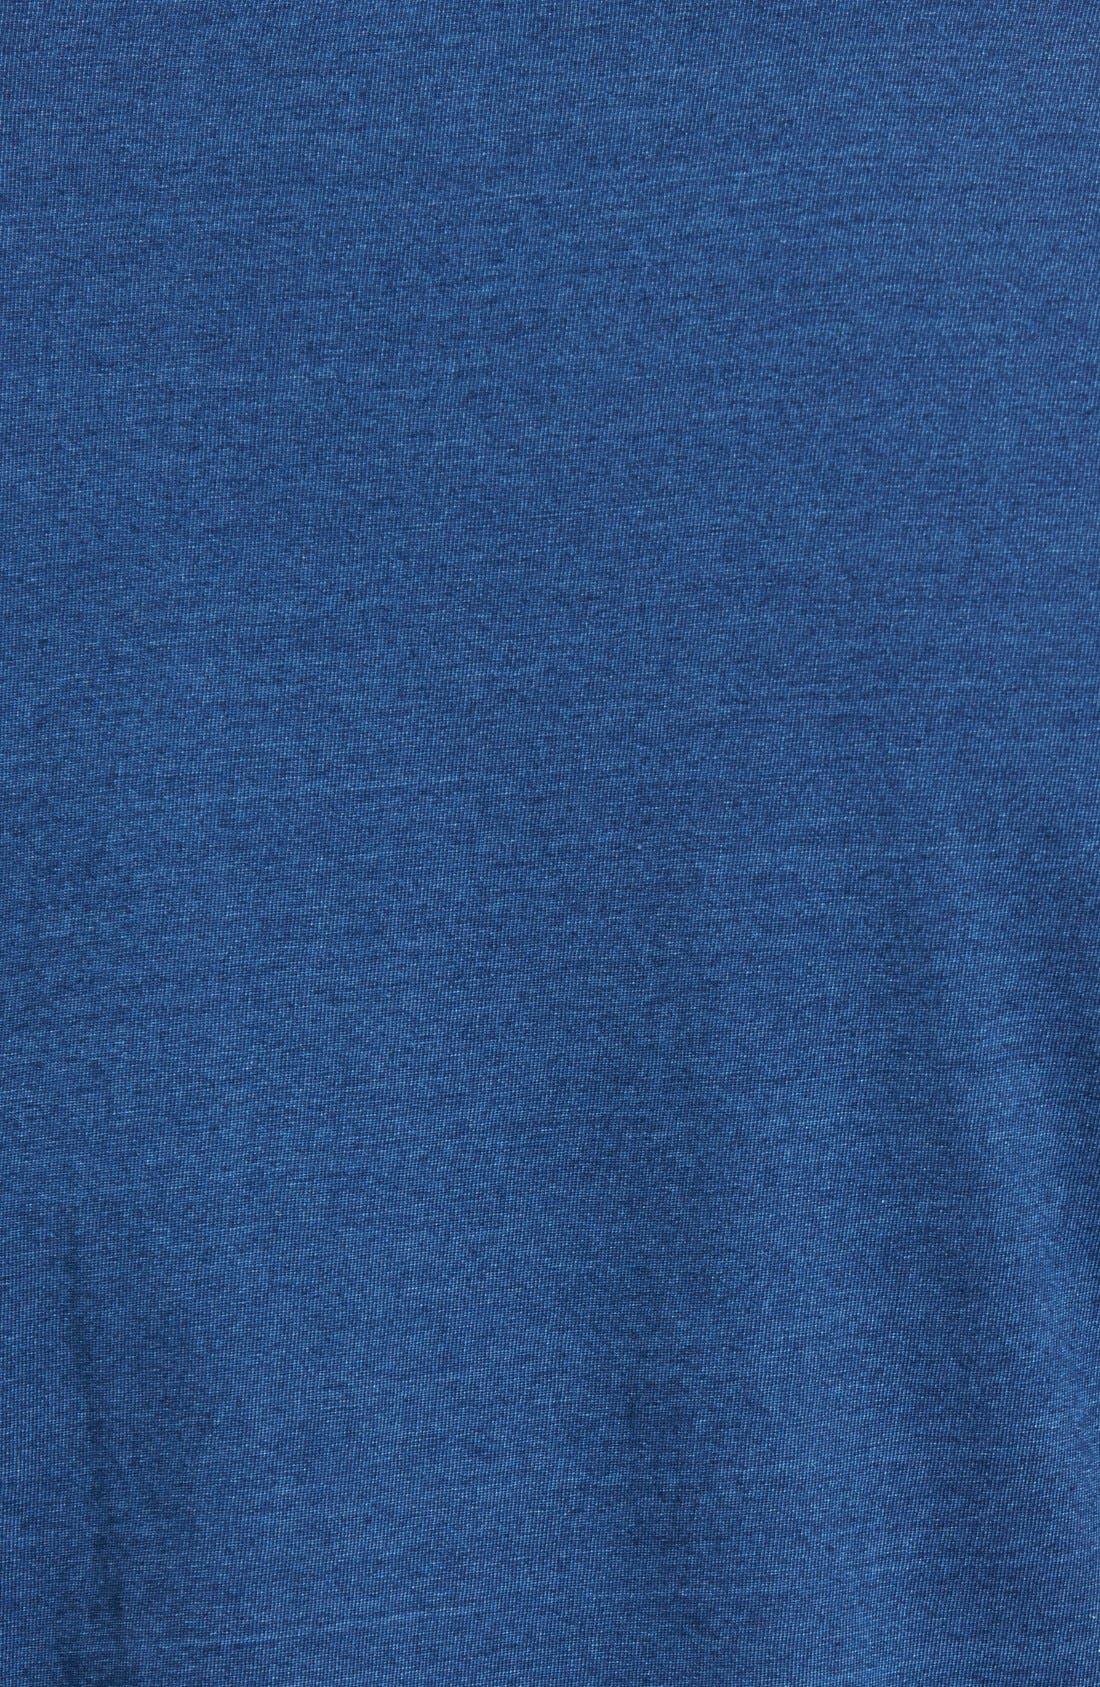 Pocket Crewneck T-Shirt,                             Alternate thumbnail 5, color,                             489